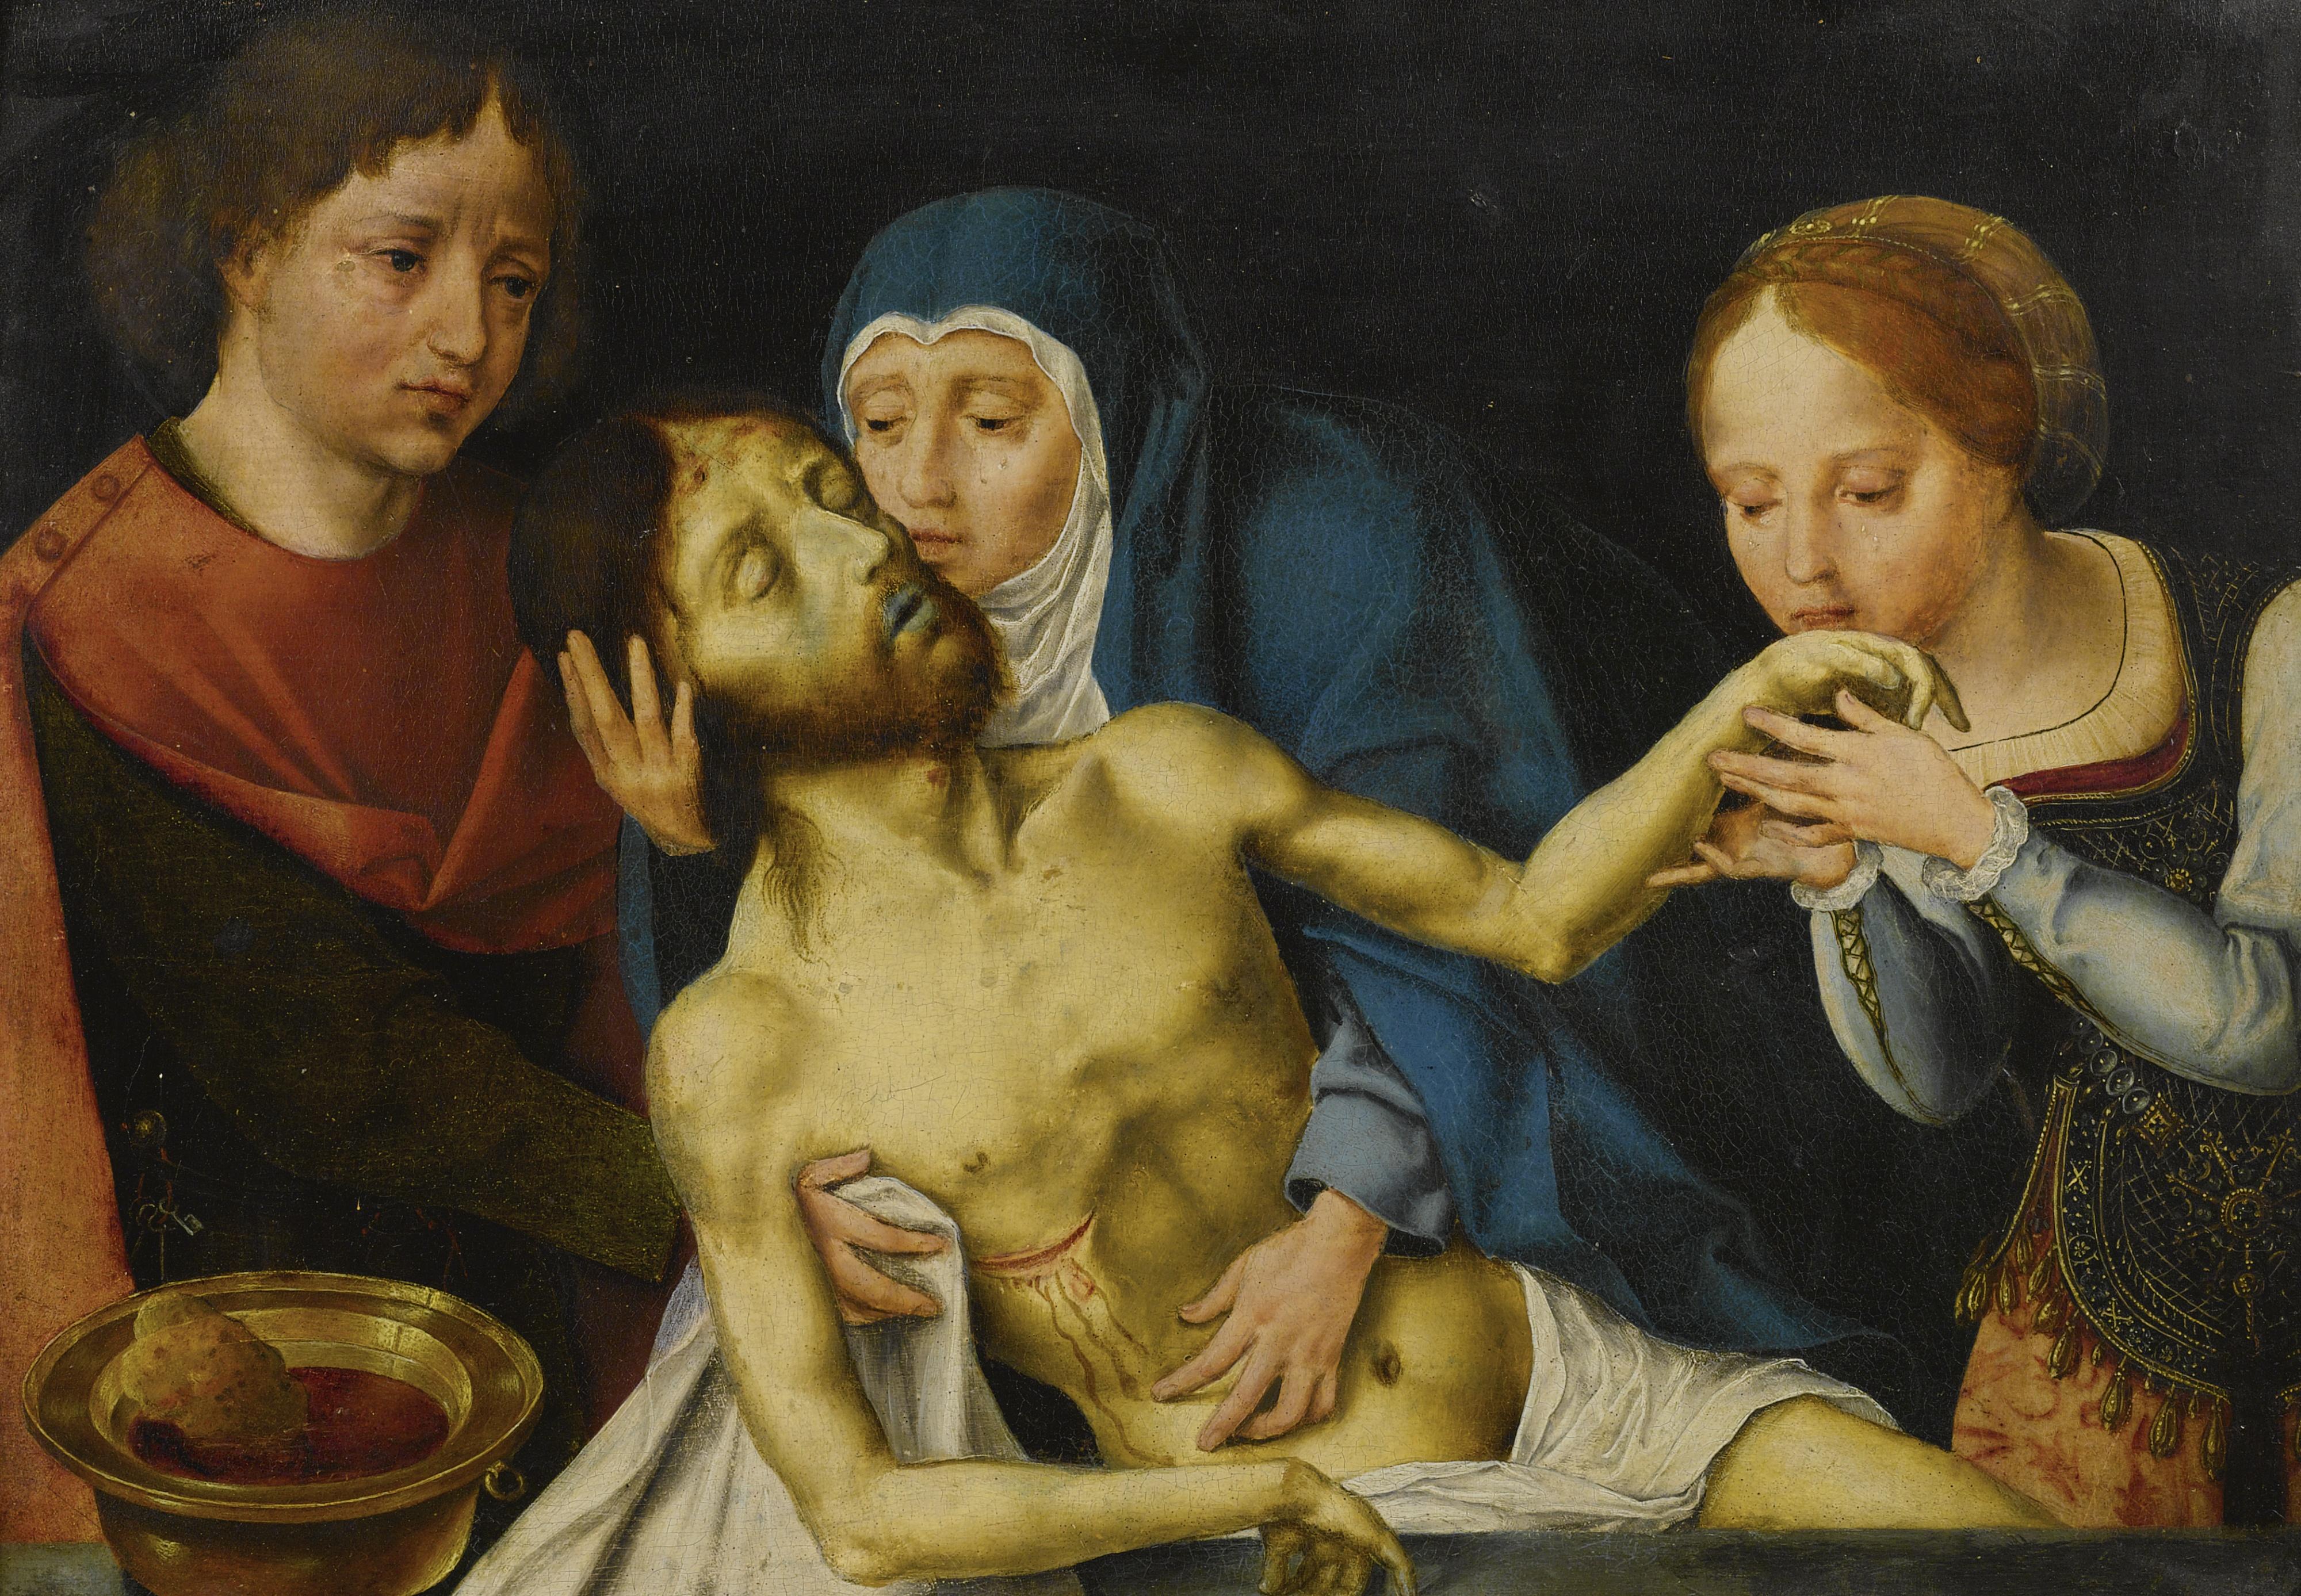 Follower Joos van Cleve. Lamentation of Christ (29 x 40)